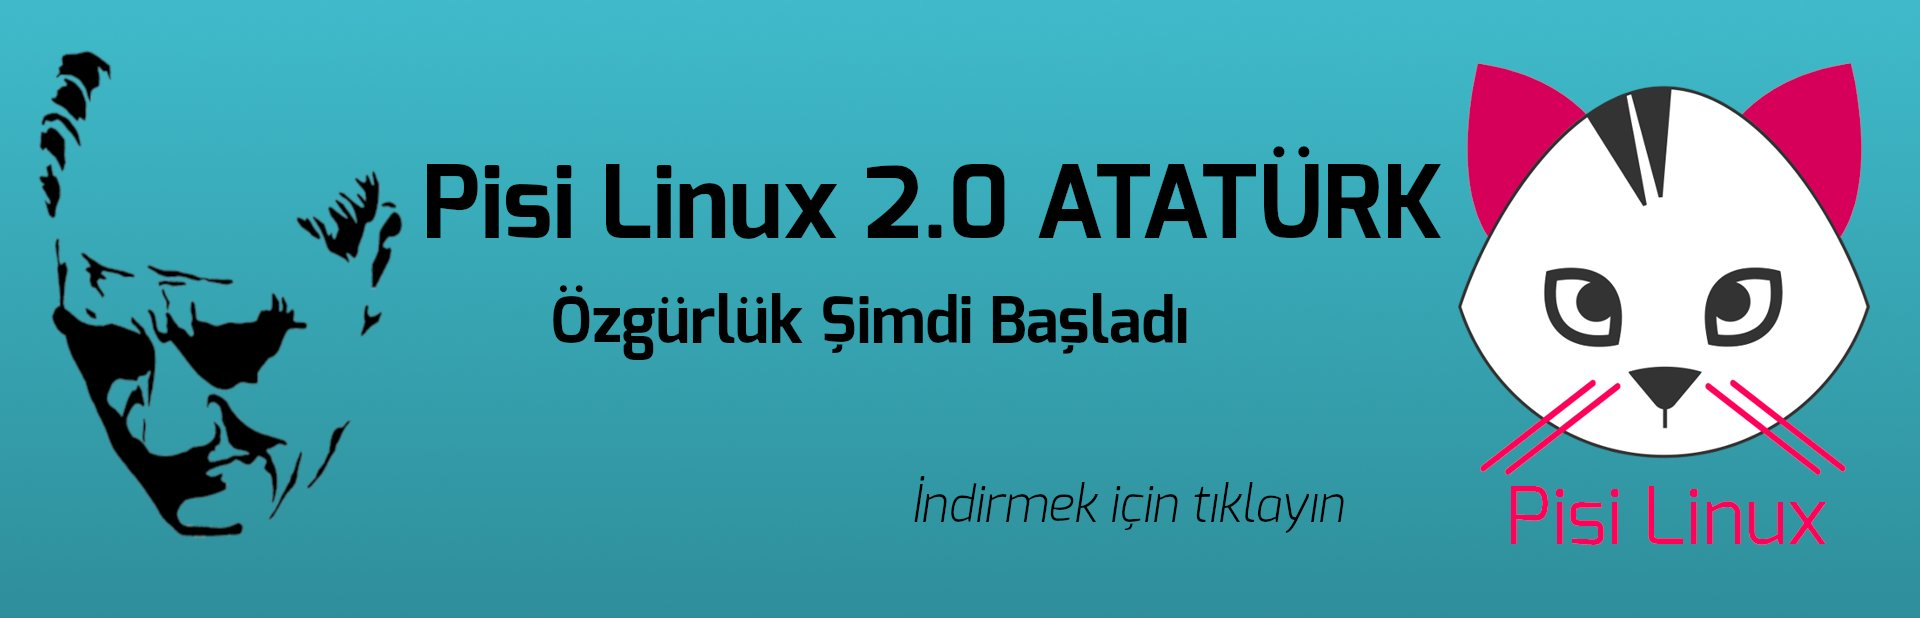 Pisi Linux 2.0  ATATÜRK